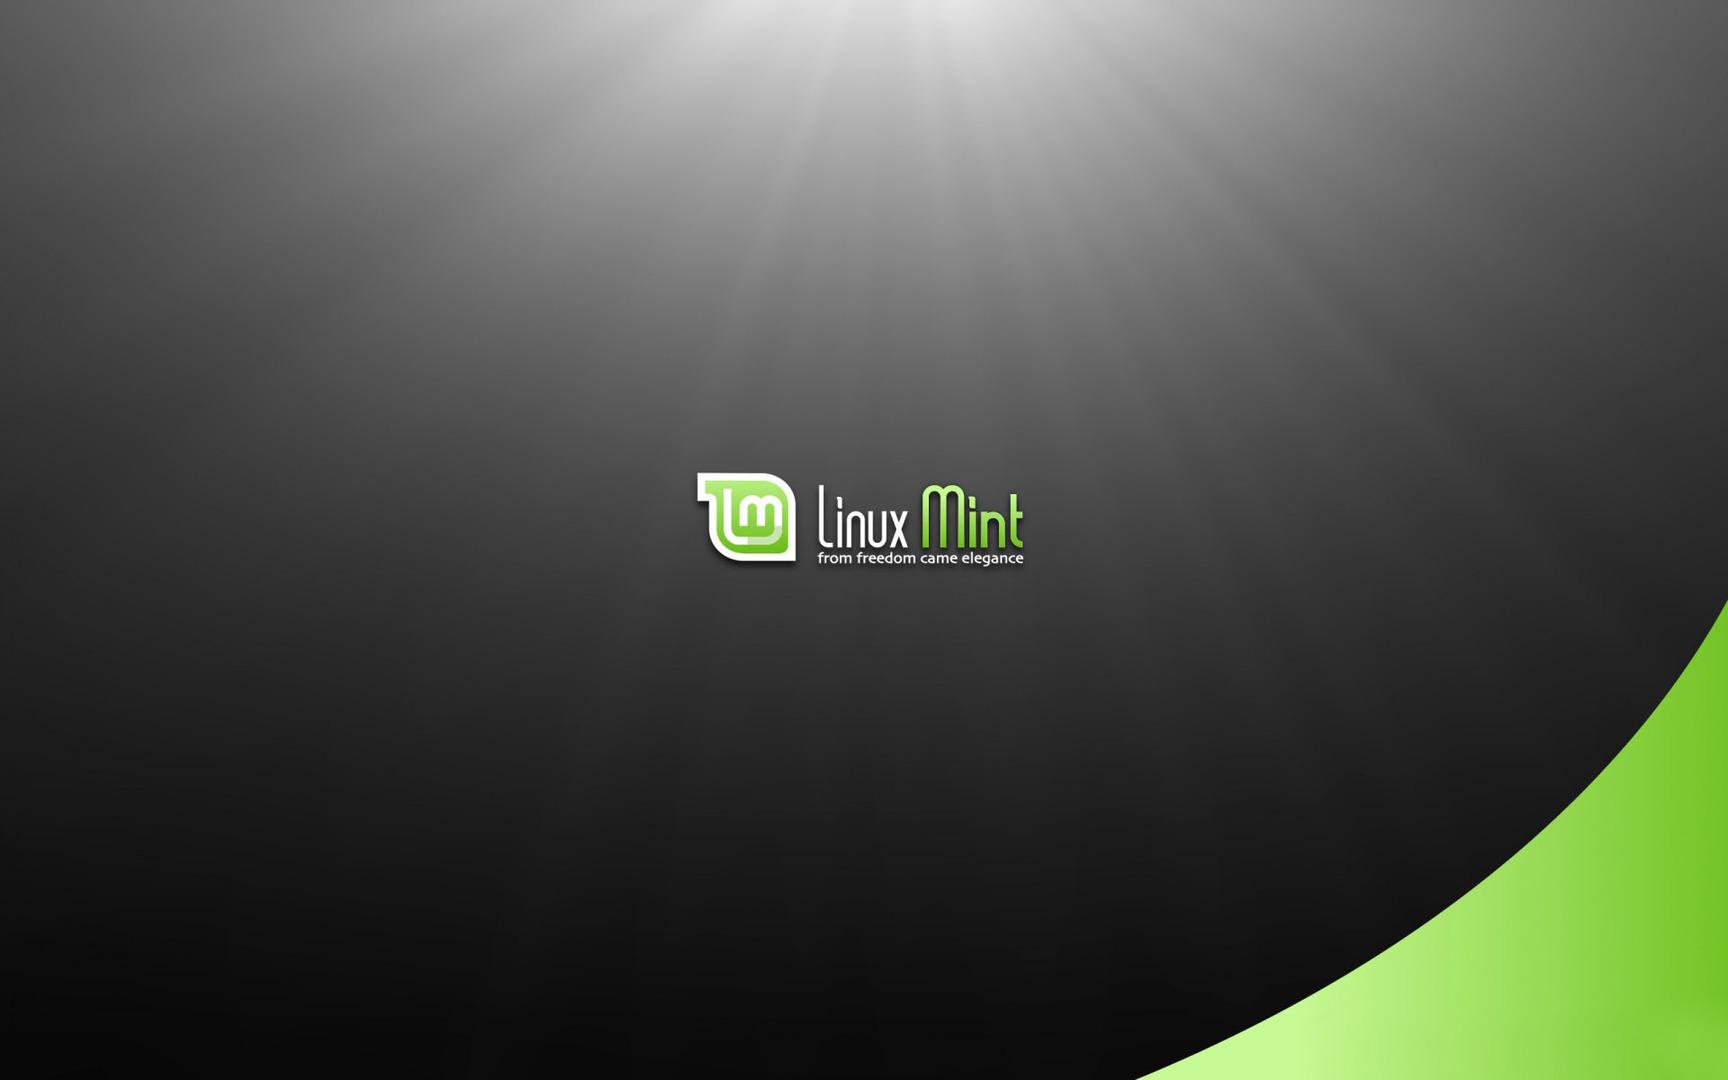 Linux Mint wallpaper 10580 1728x1080